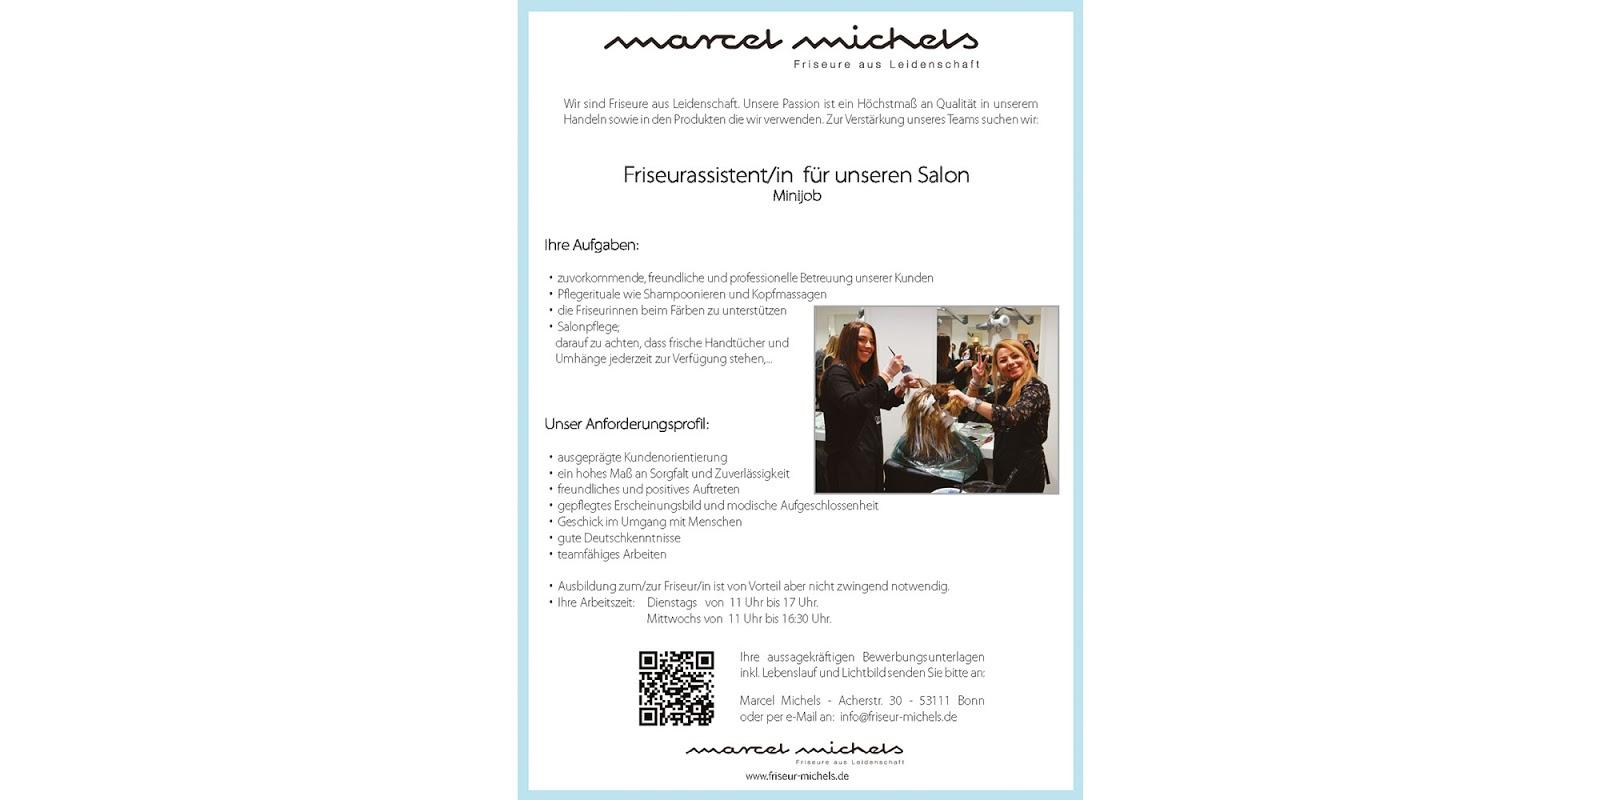 Exklusives Haarschneideseminar Mit Michael Bredtmann Friseur Bonn